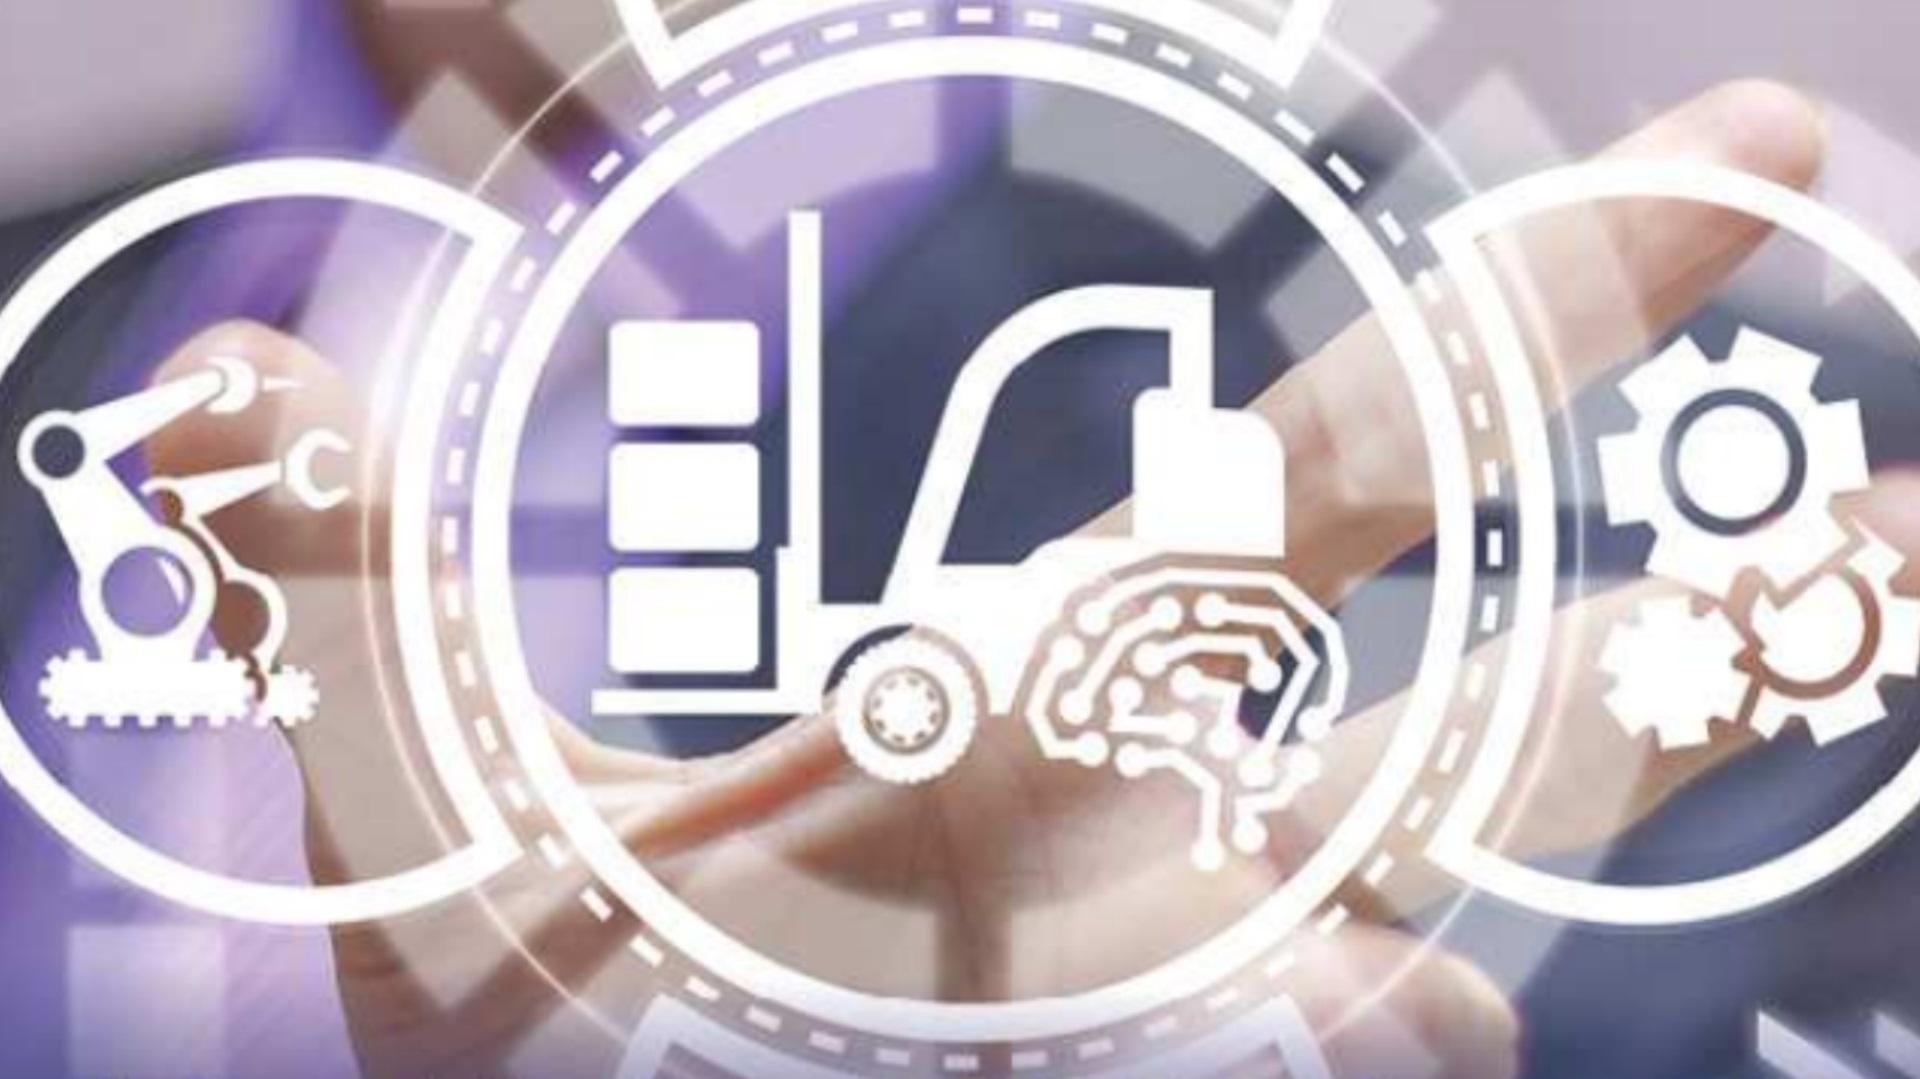 Digital technologies for Logistics and Transportation